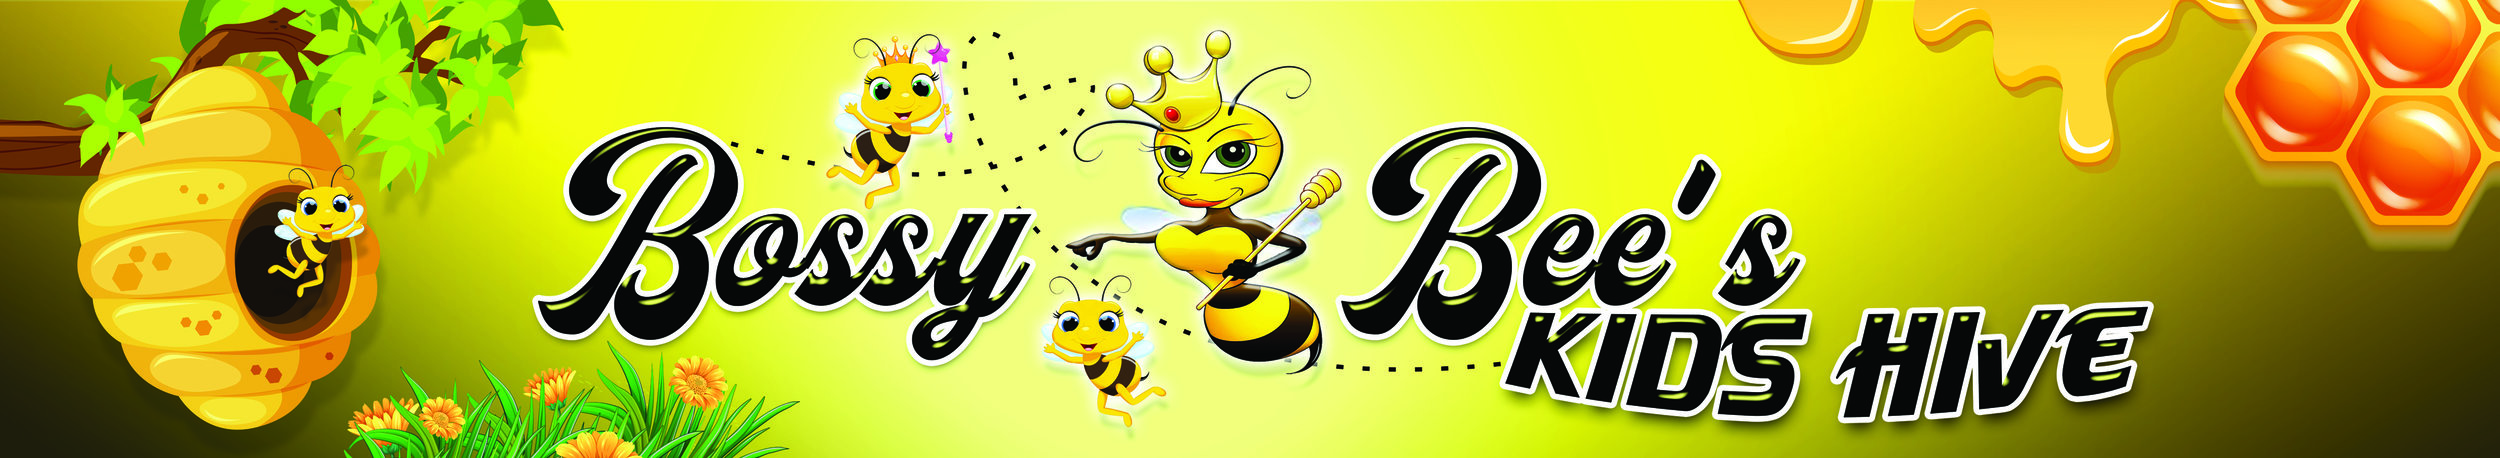 Bossy Bee's Kids Hive  N3, N4 Main St.  323-308-5363  marthavalencia8888@gmail.com